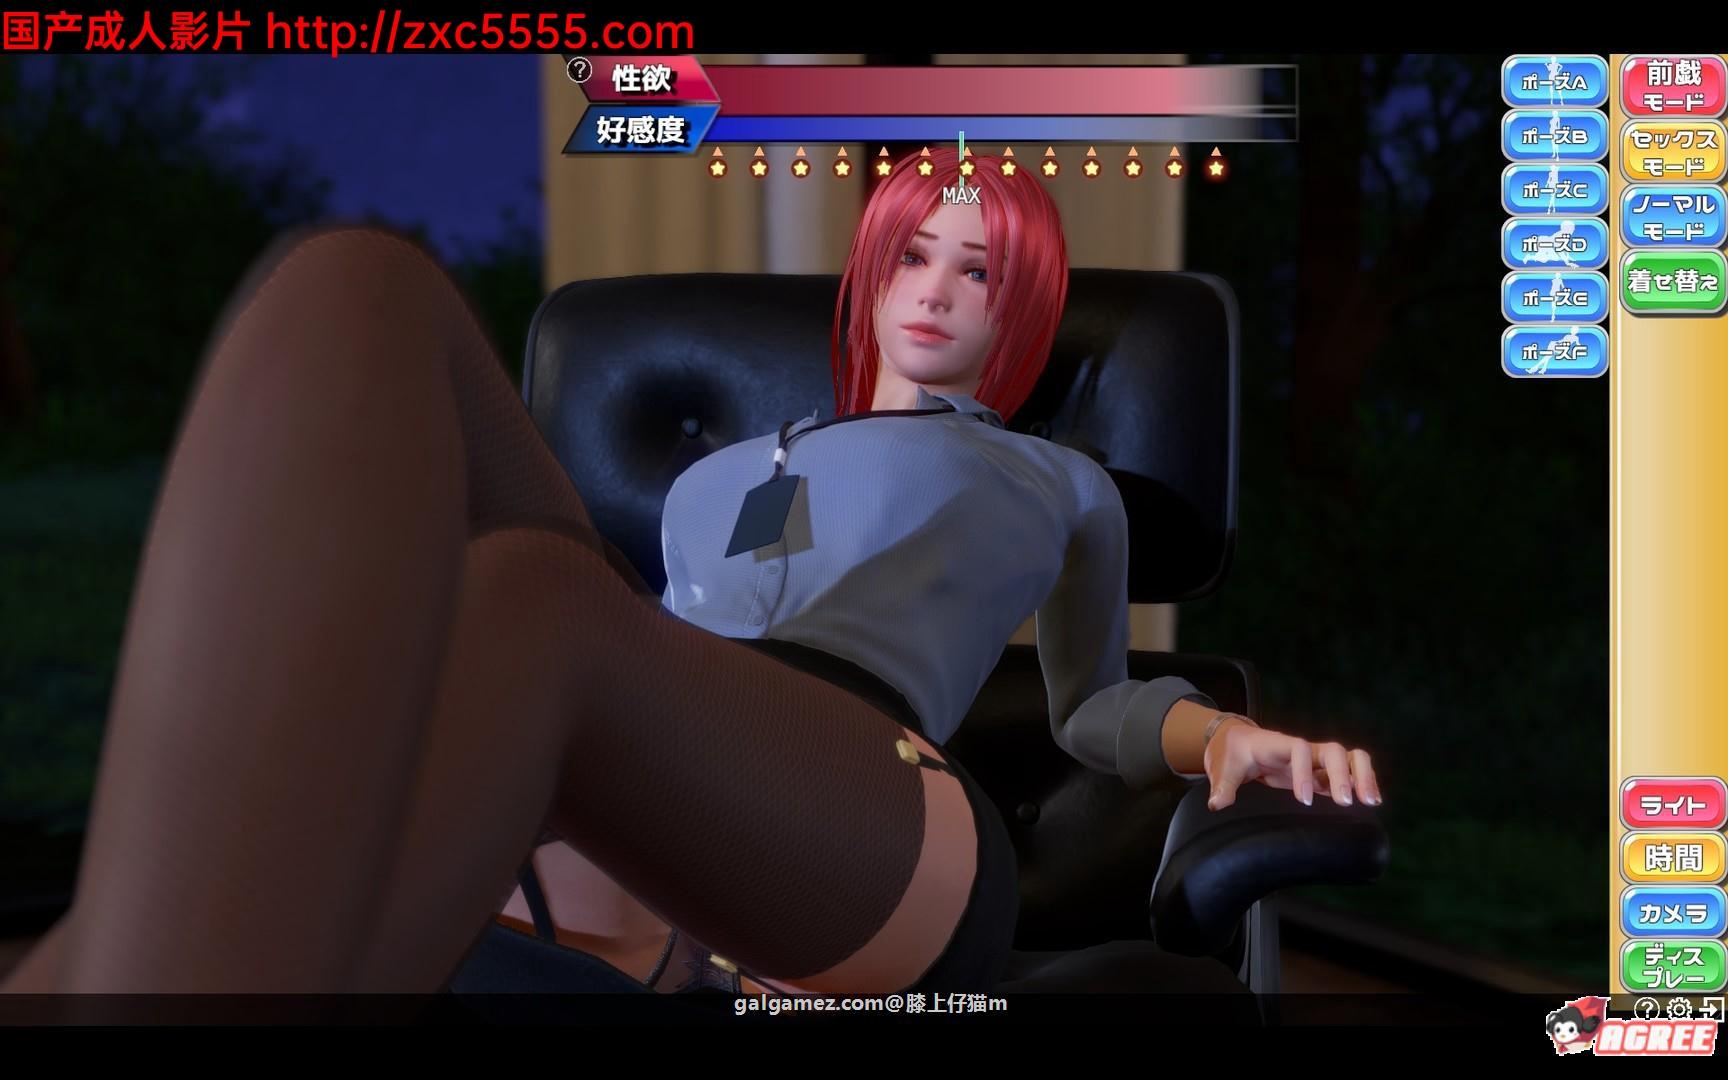 [3D互动/中文/全动态]完美女友:PerfectLover V1.21 官中步兵版+存档[黑丝裤袜][2.4G/微软网盘]